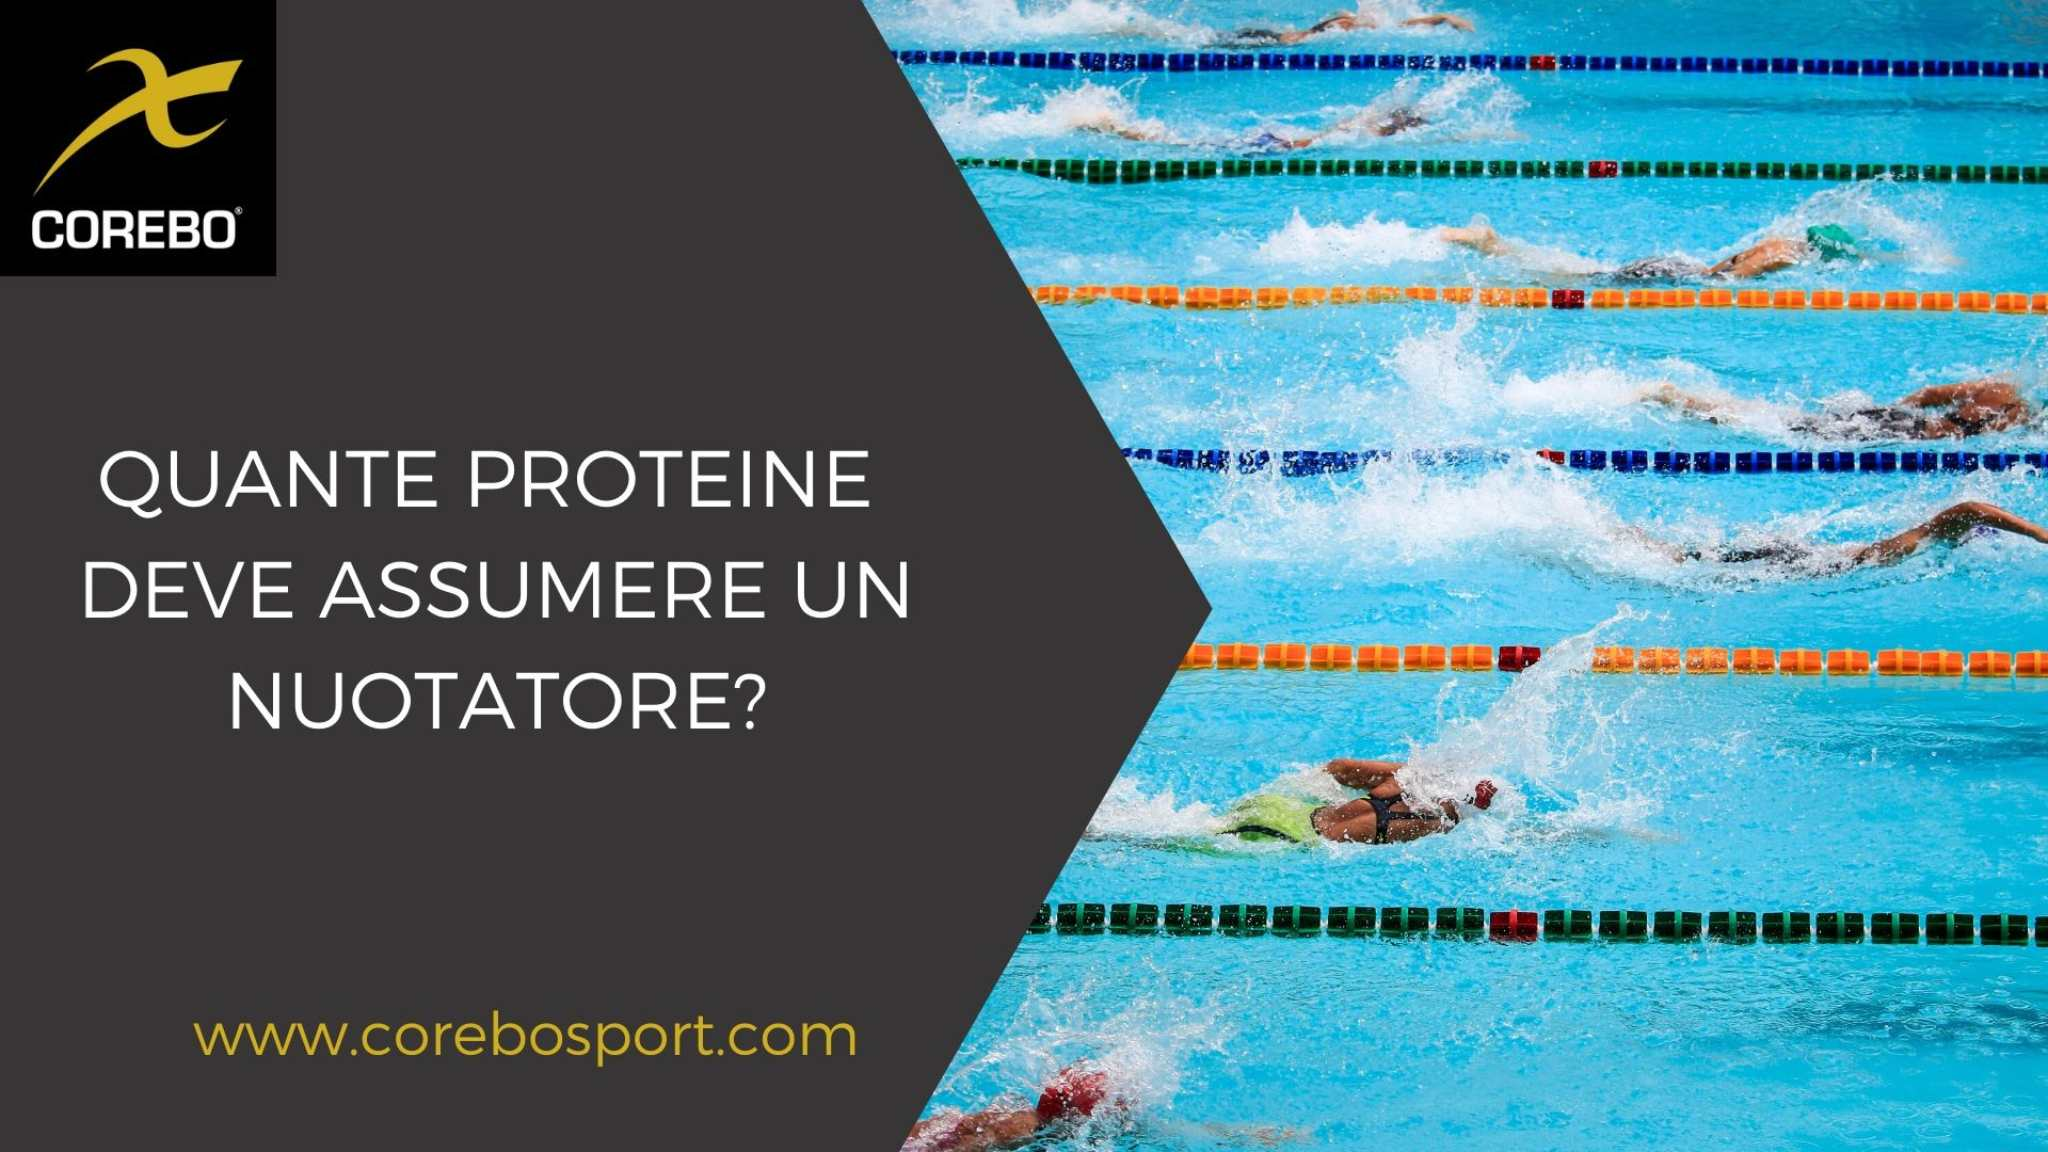 quante proteine deve assumere un nuotatore